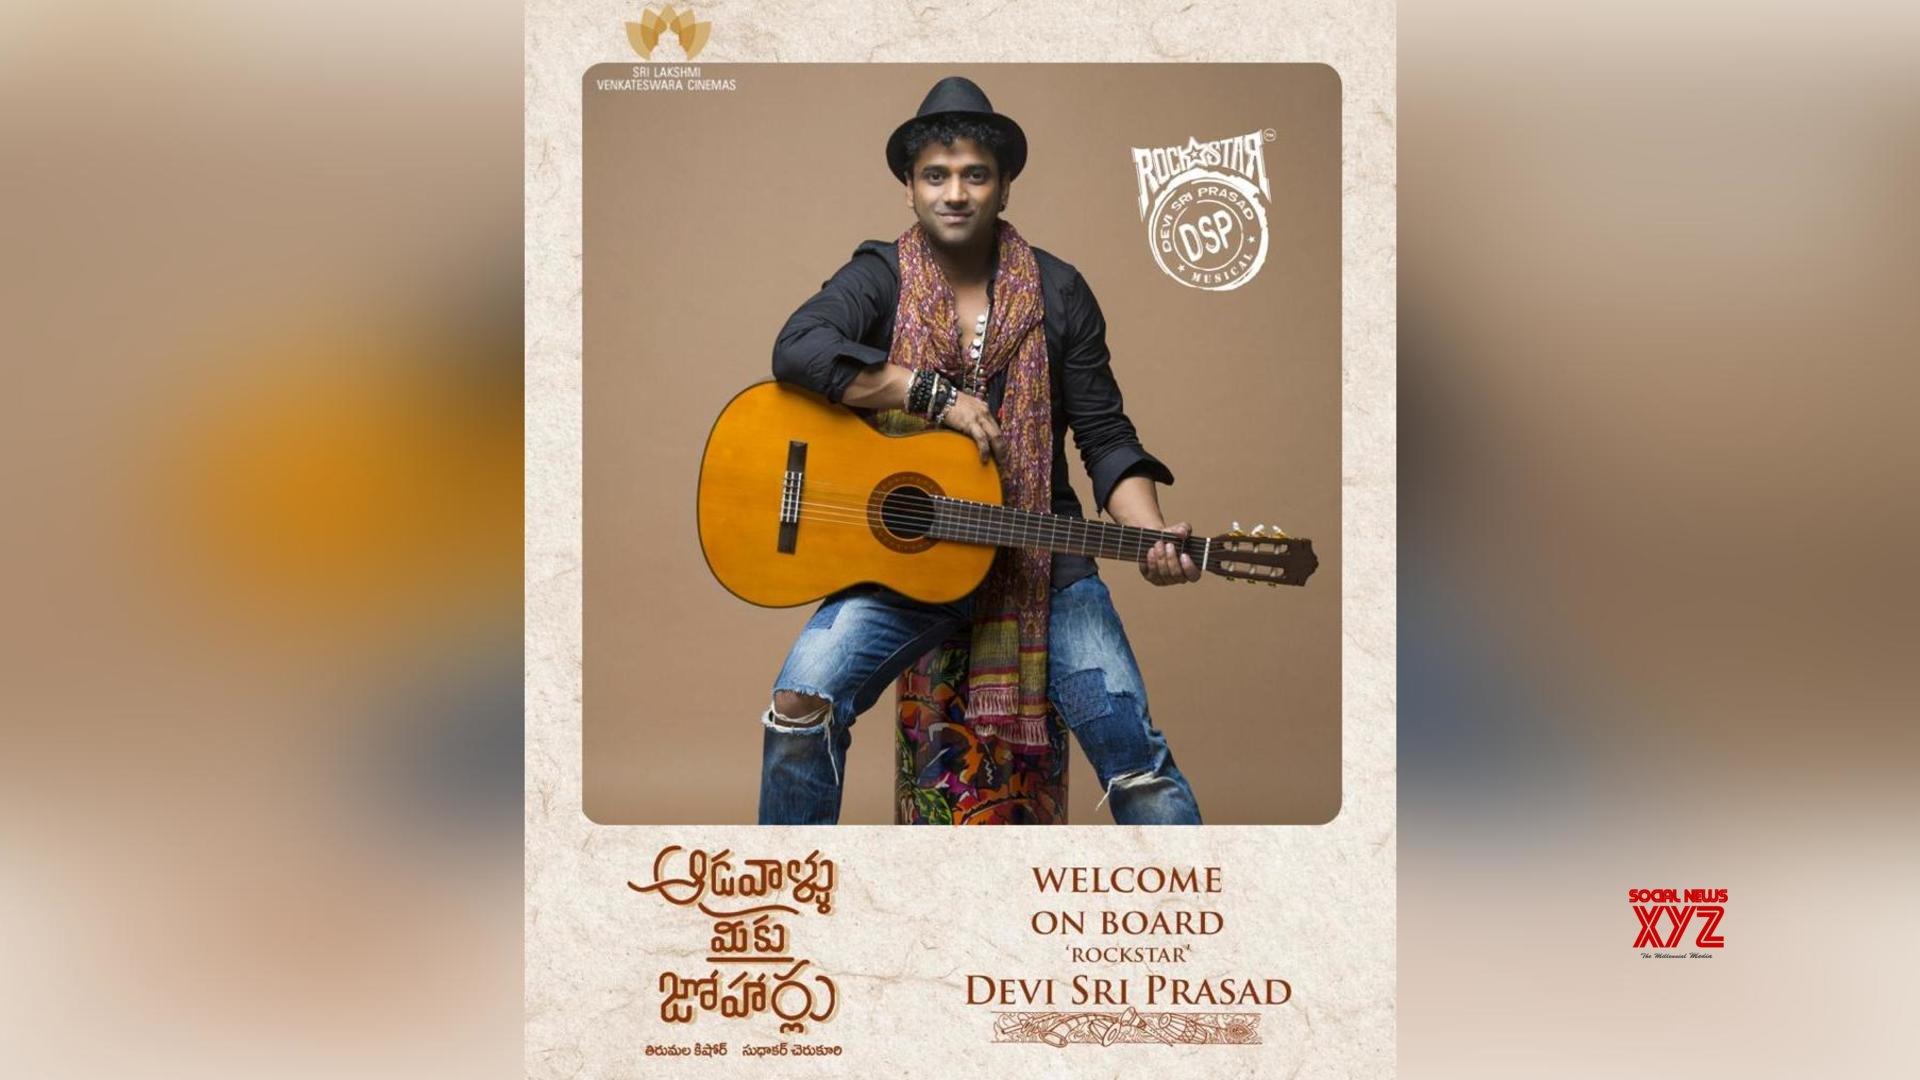 Devi Sri Prasad To Score Music For Sharwanand And Rashmika Mandanna's Aadavaallu Meeku Joharlu Movie